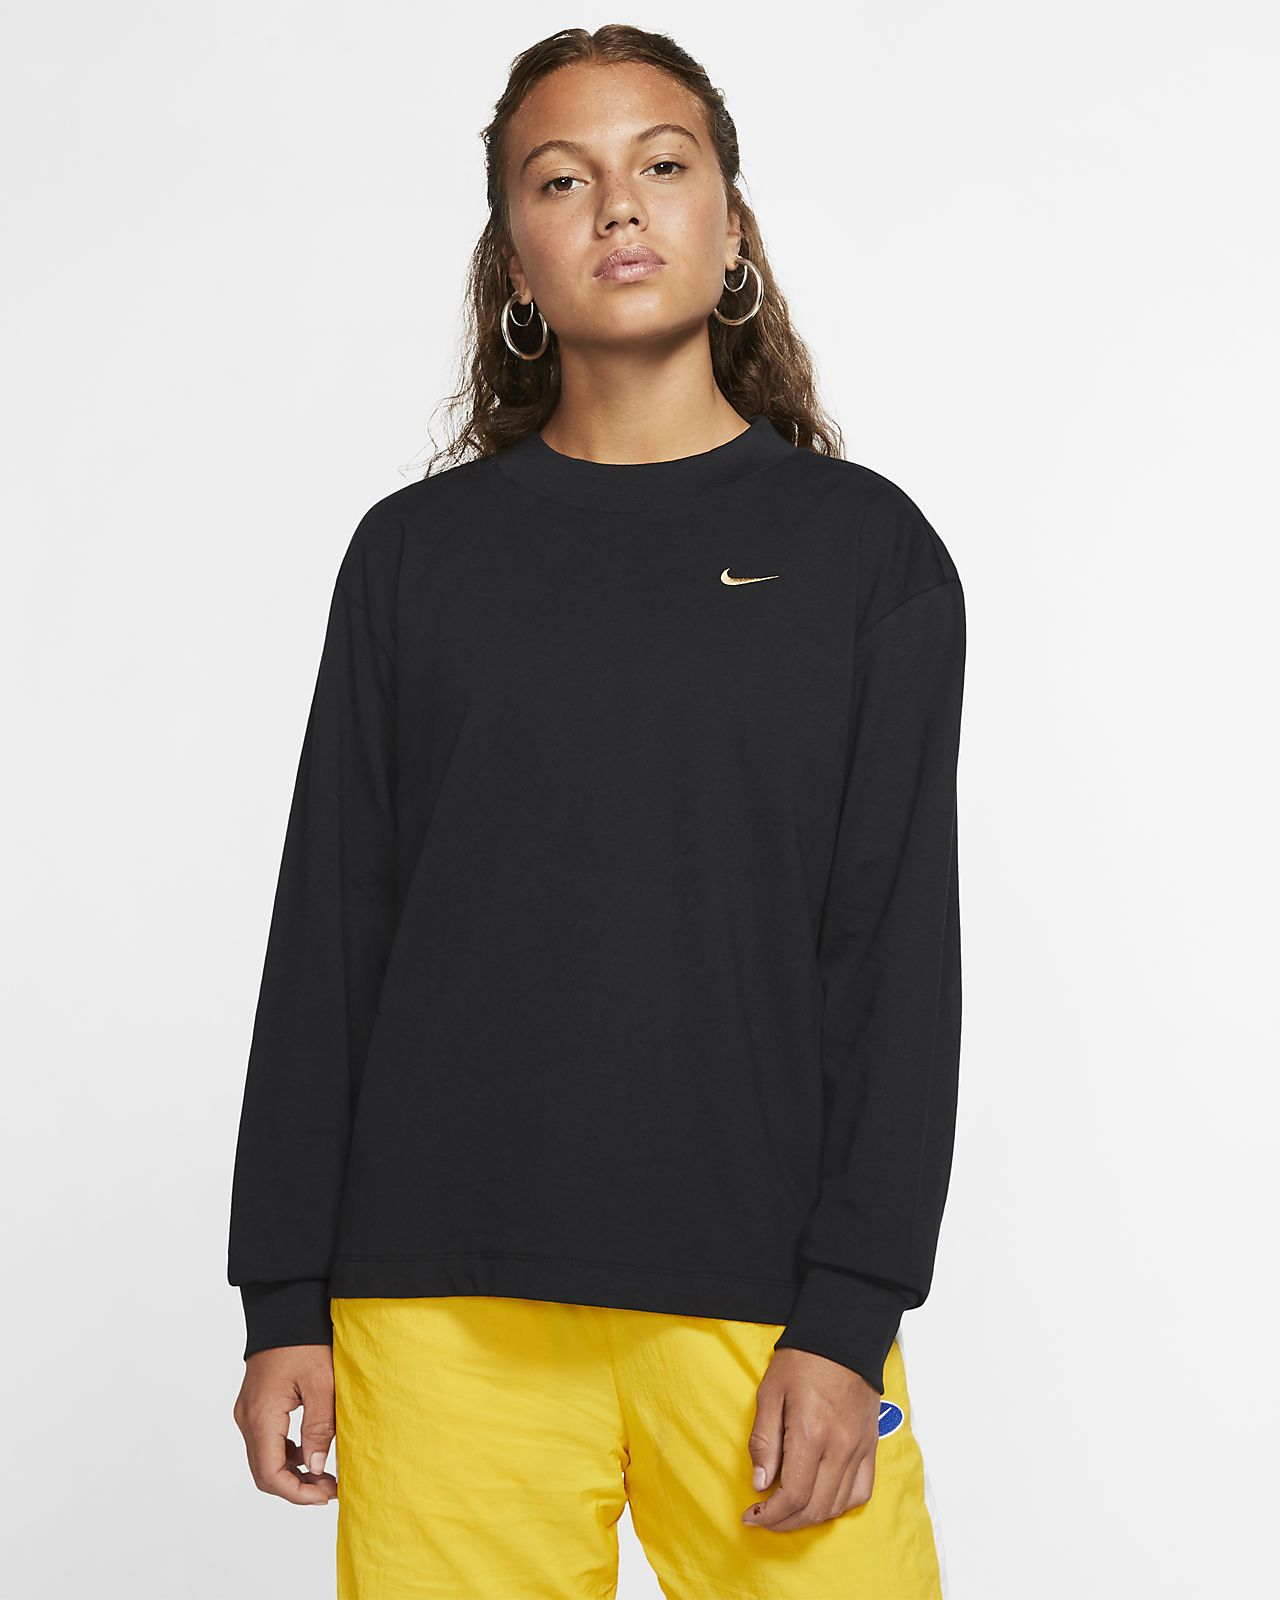 Available Women Nike Air Long Sleeve T Shirt Black